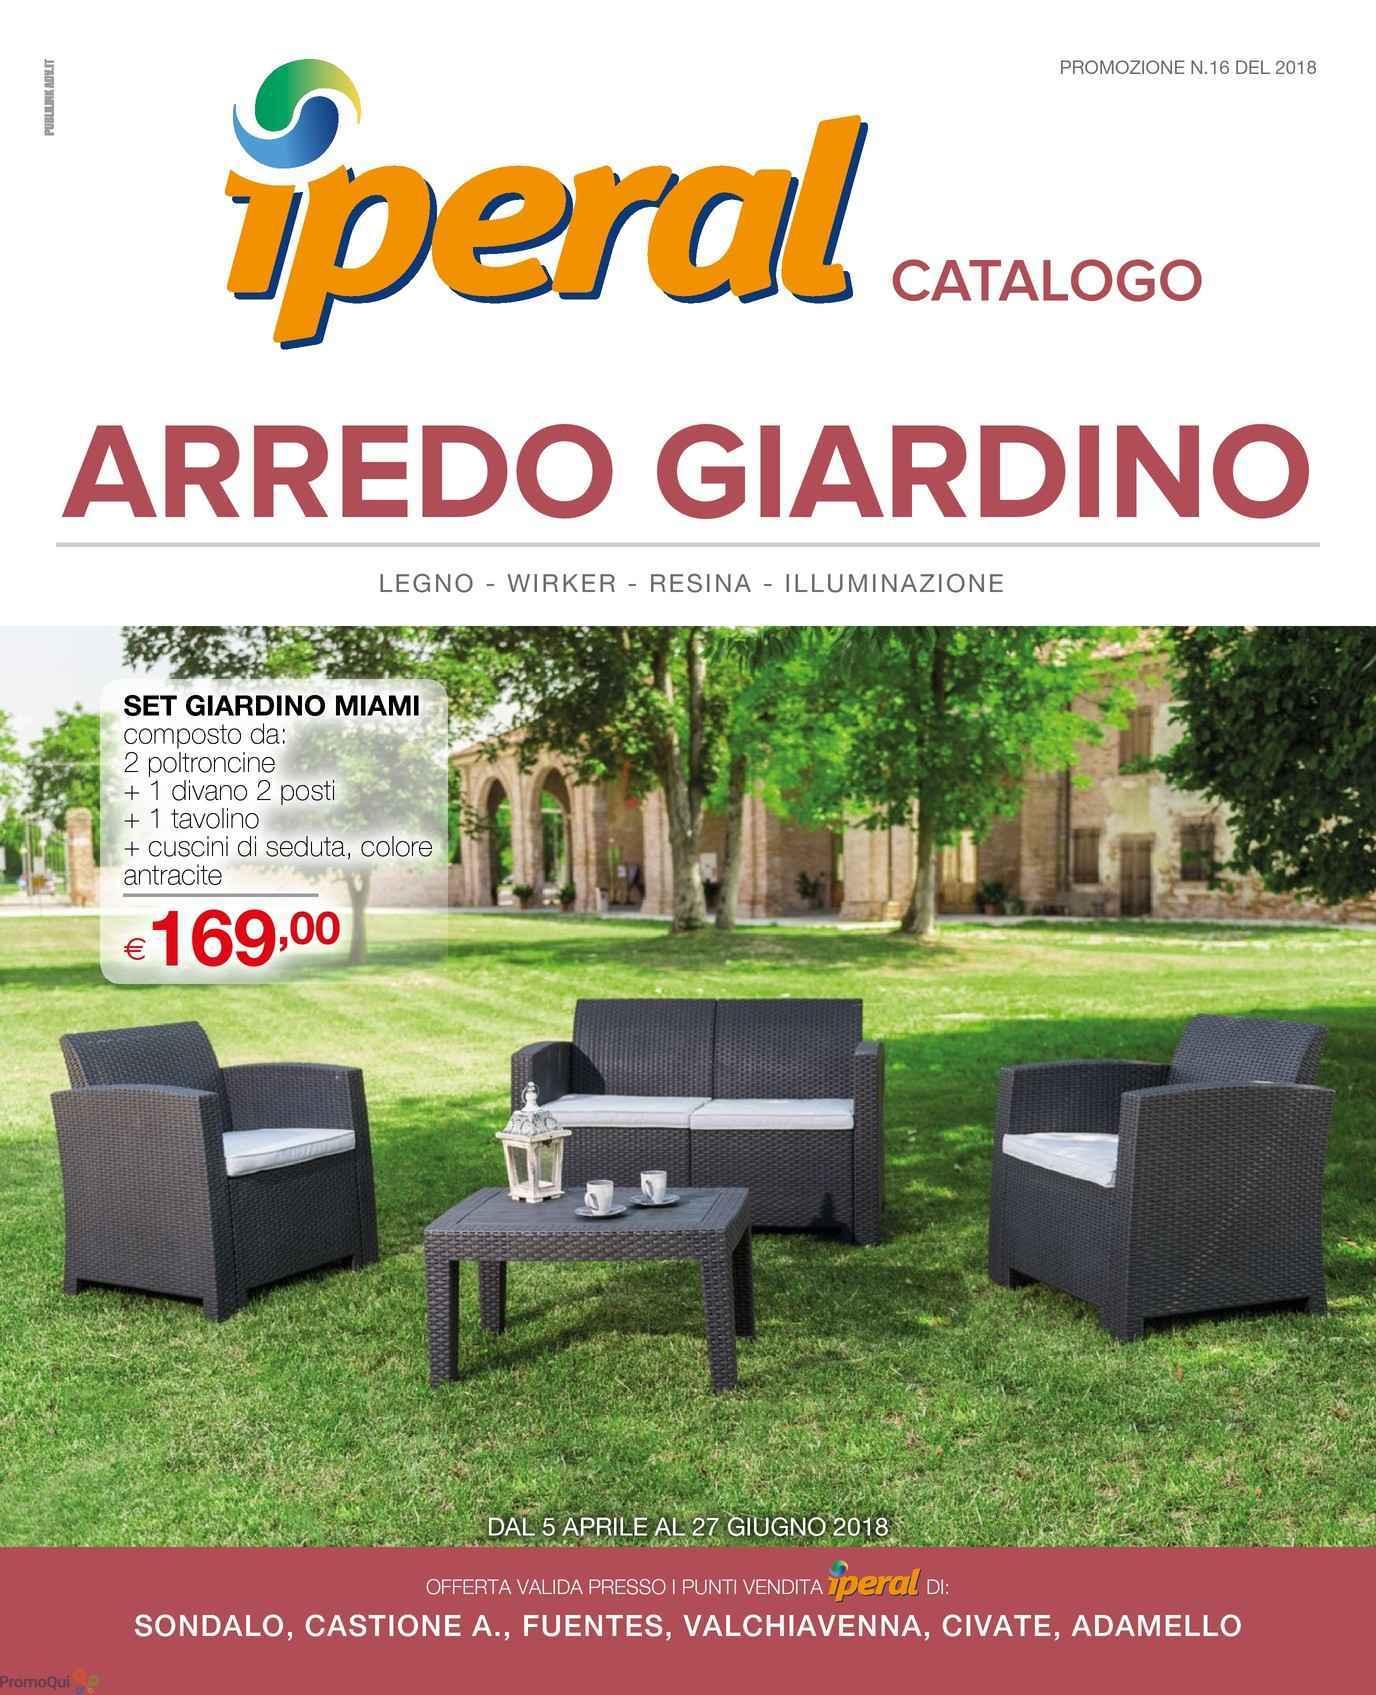 Emejing Arredo Giardino Offerte Photos - dairiakymber.com ...